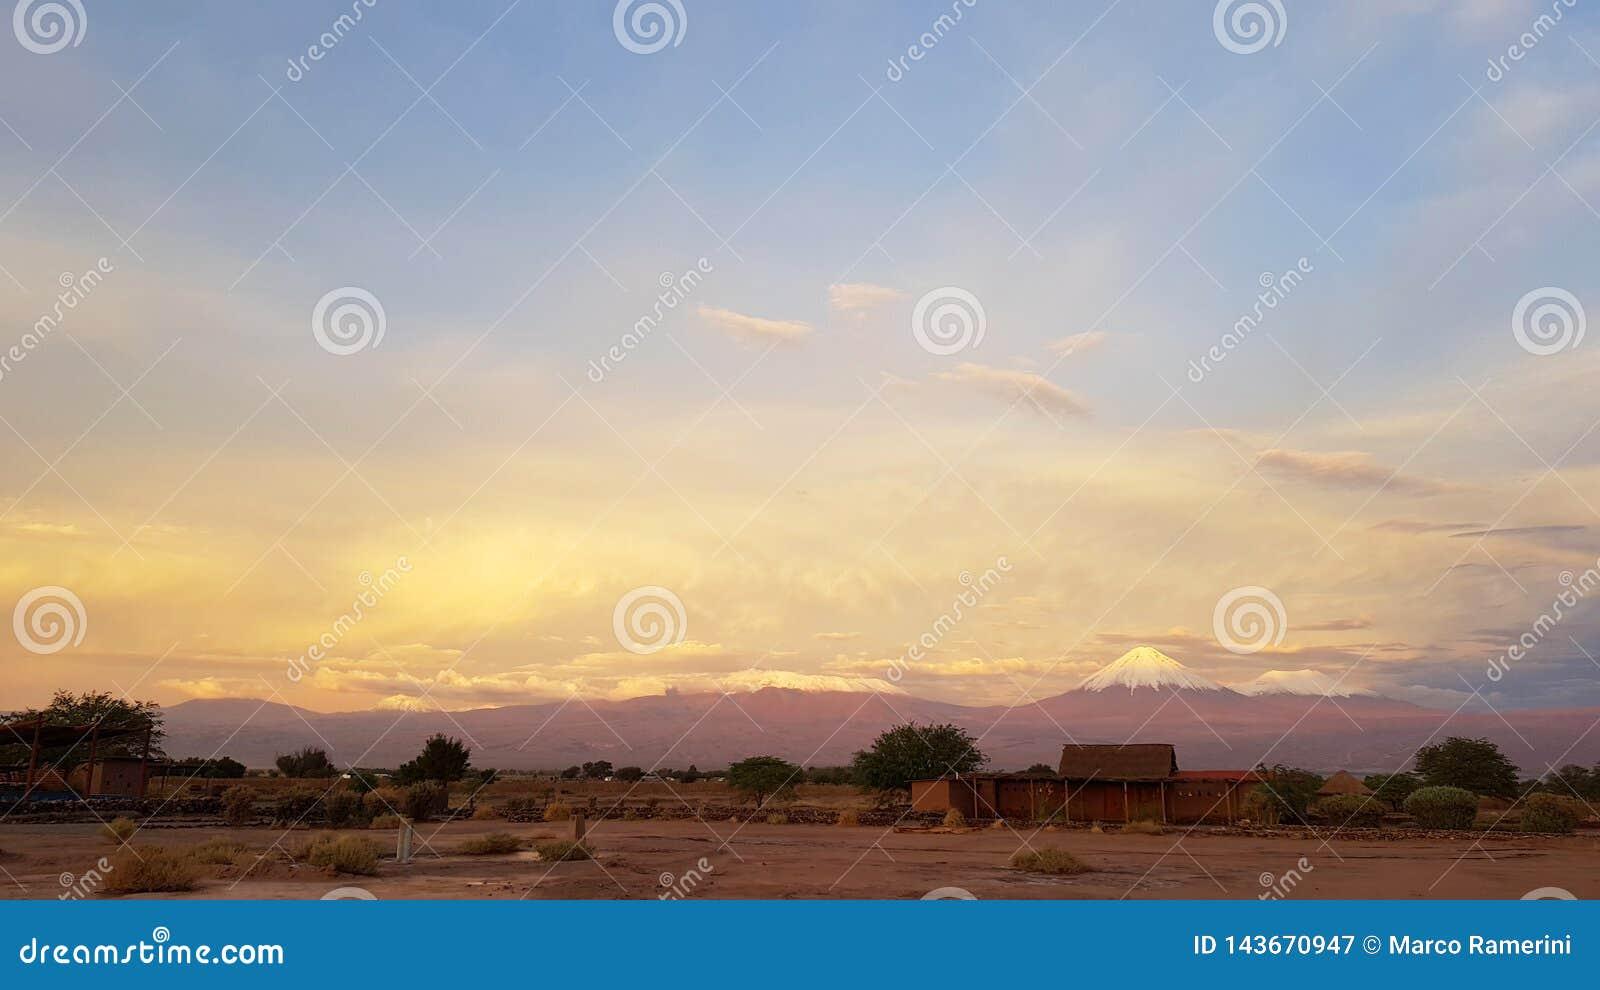 Sunset lights in the arid and desolate landscape of the Atacama Desert